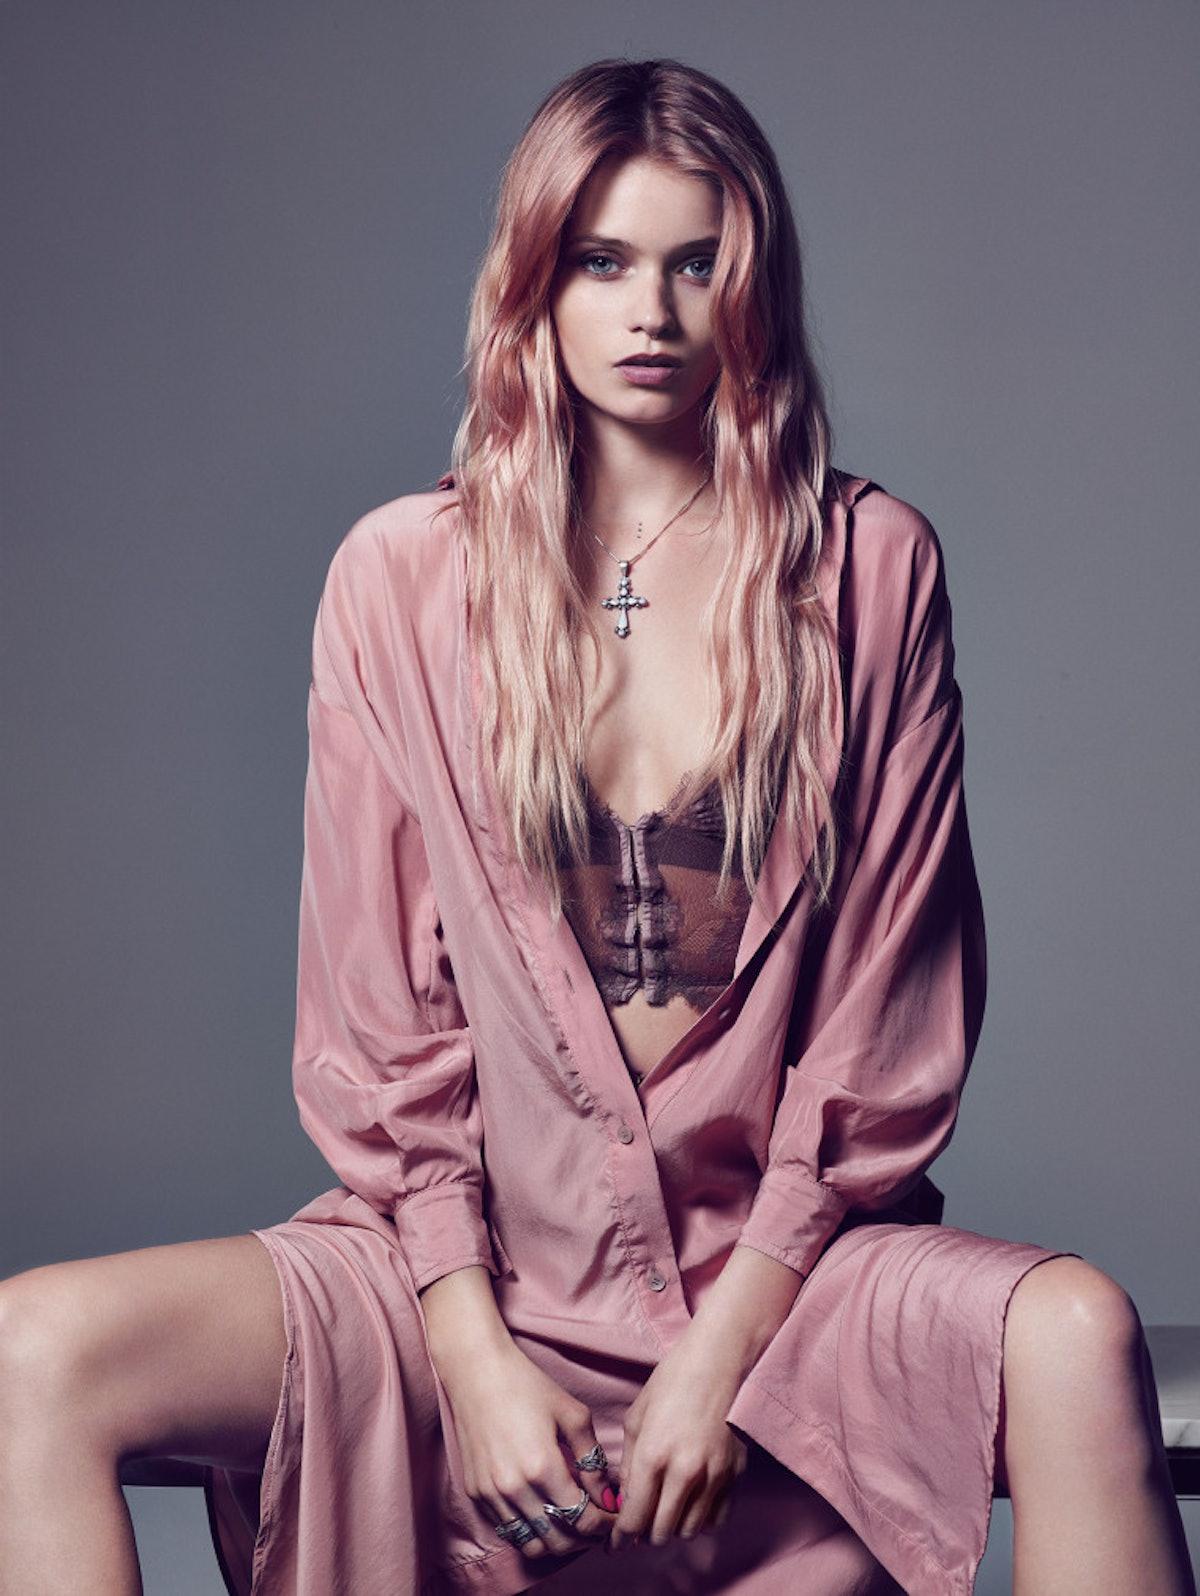 Model-Actresses